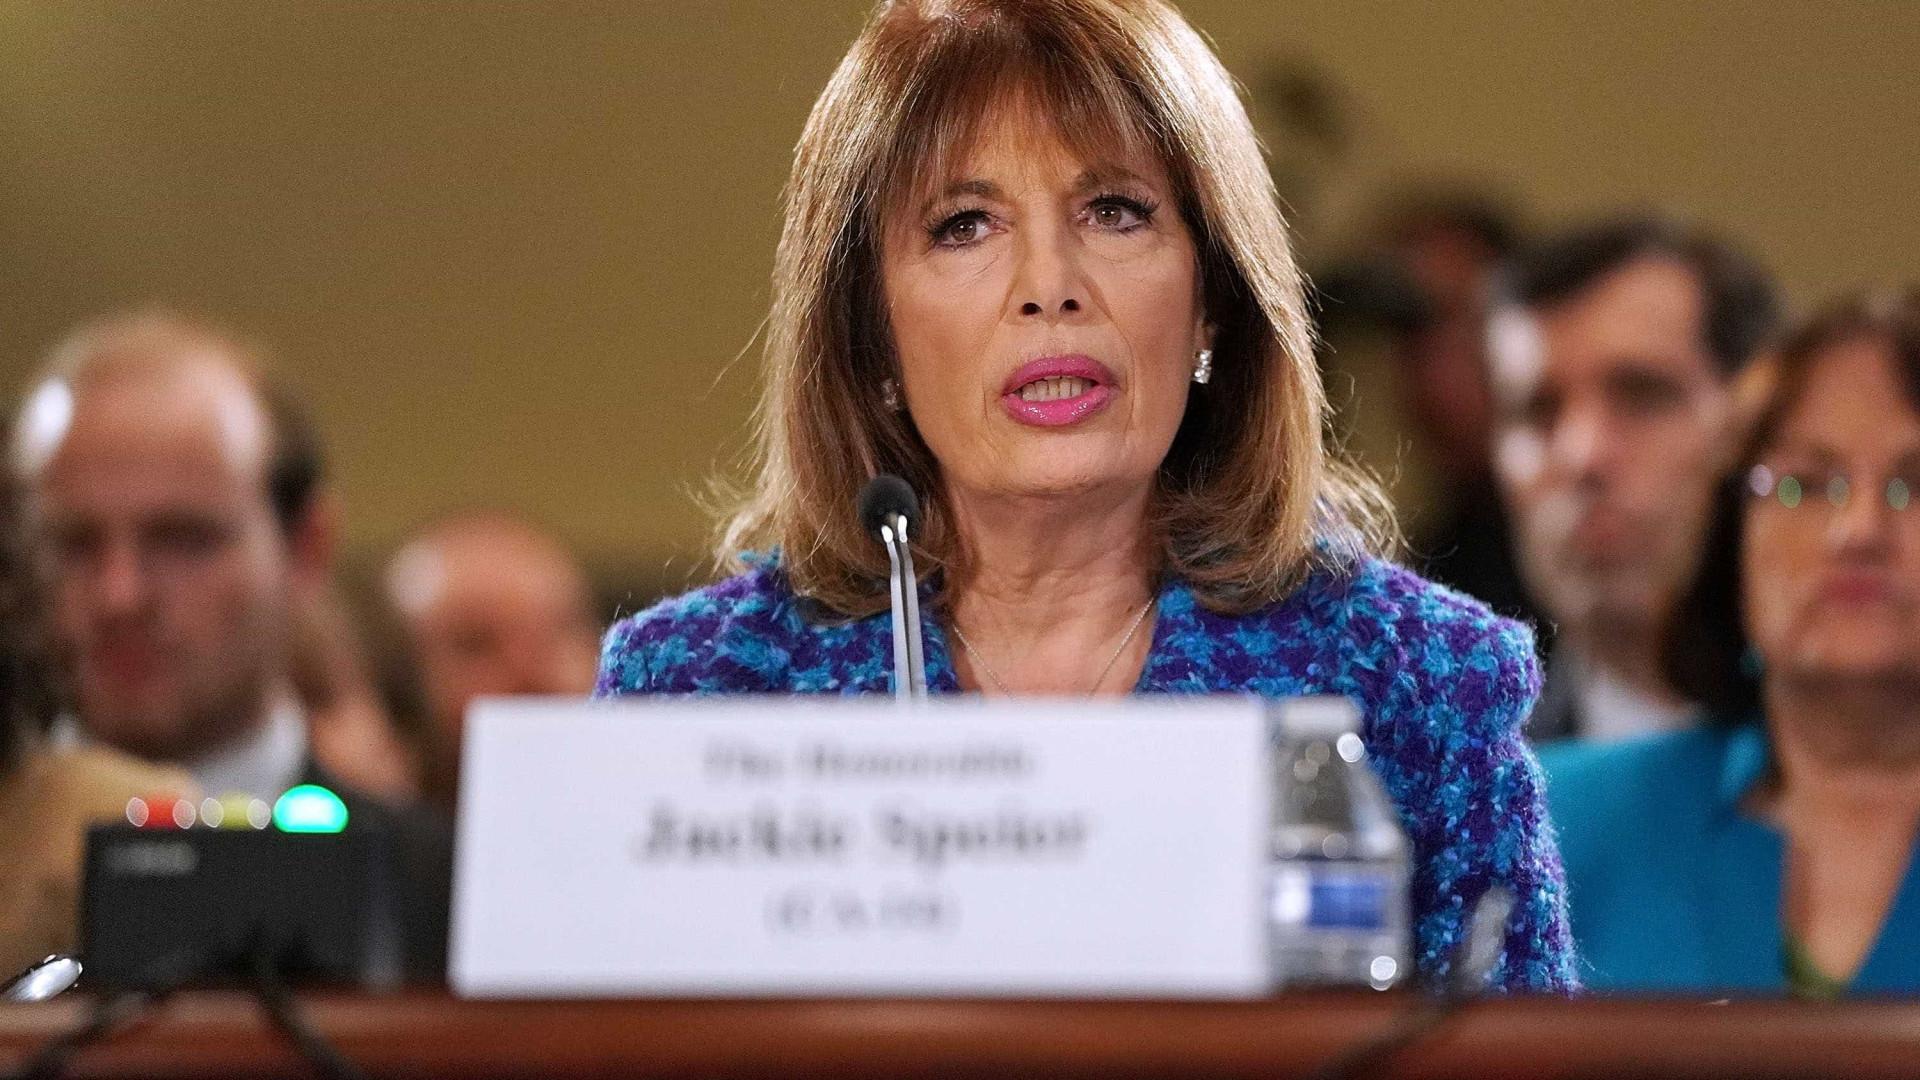 Escândalo do assédio sexual chega ao Congresso